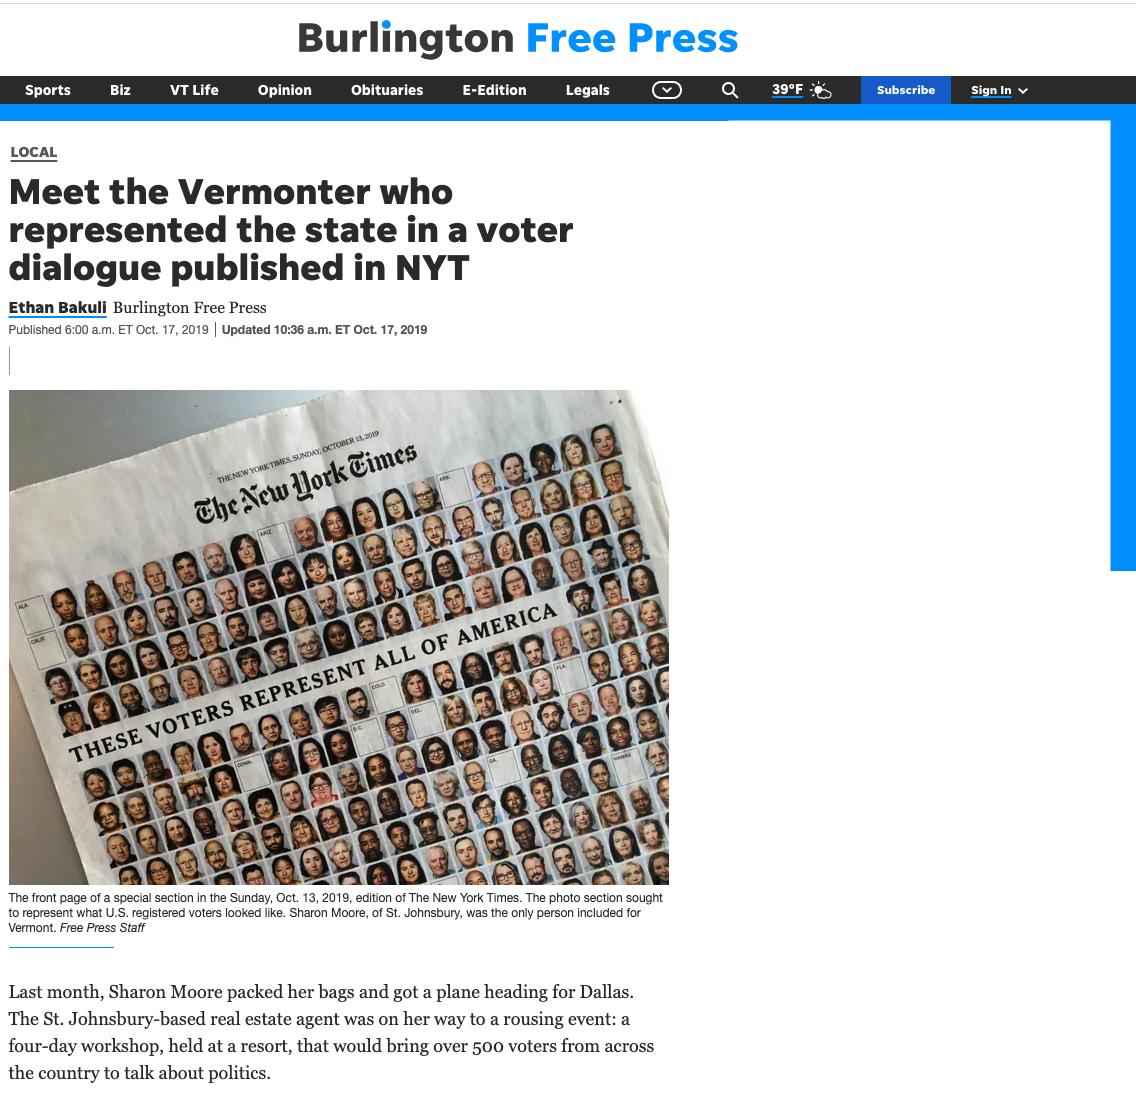 BurlingtonFreePress